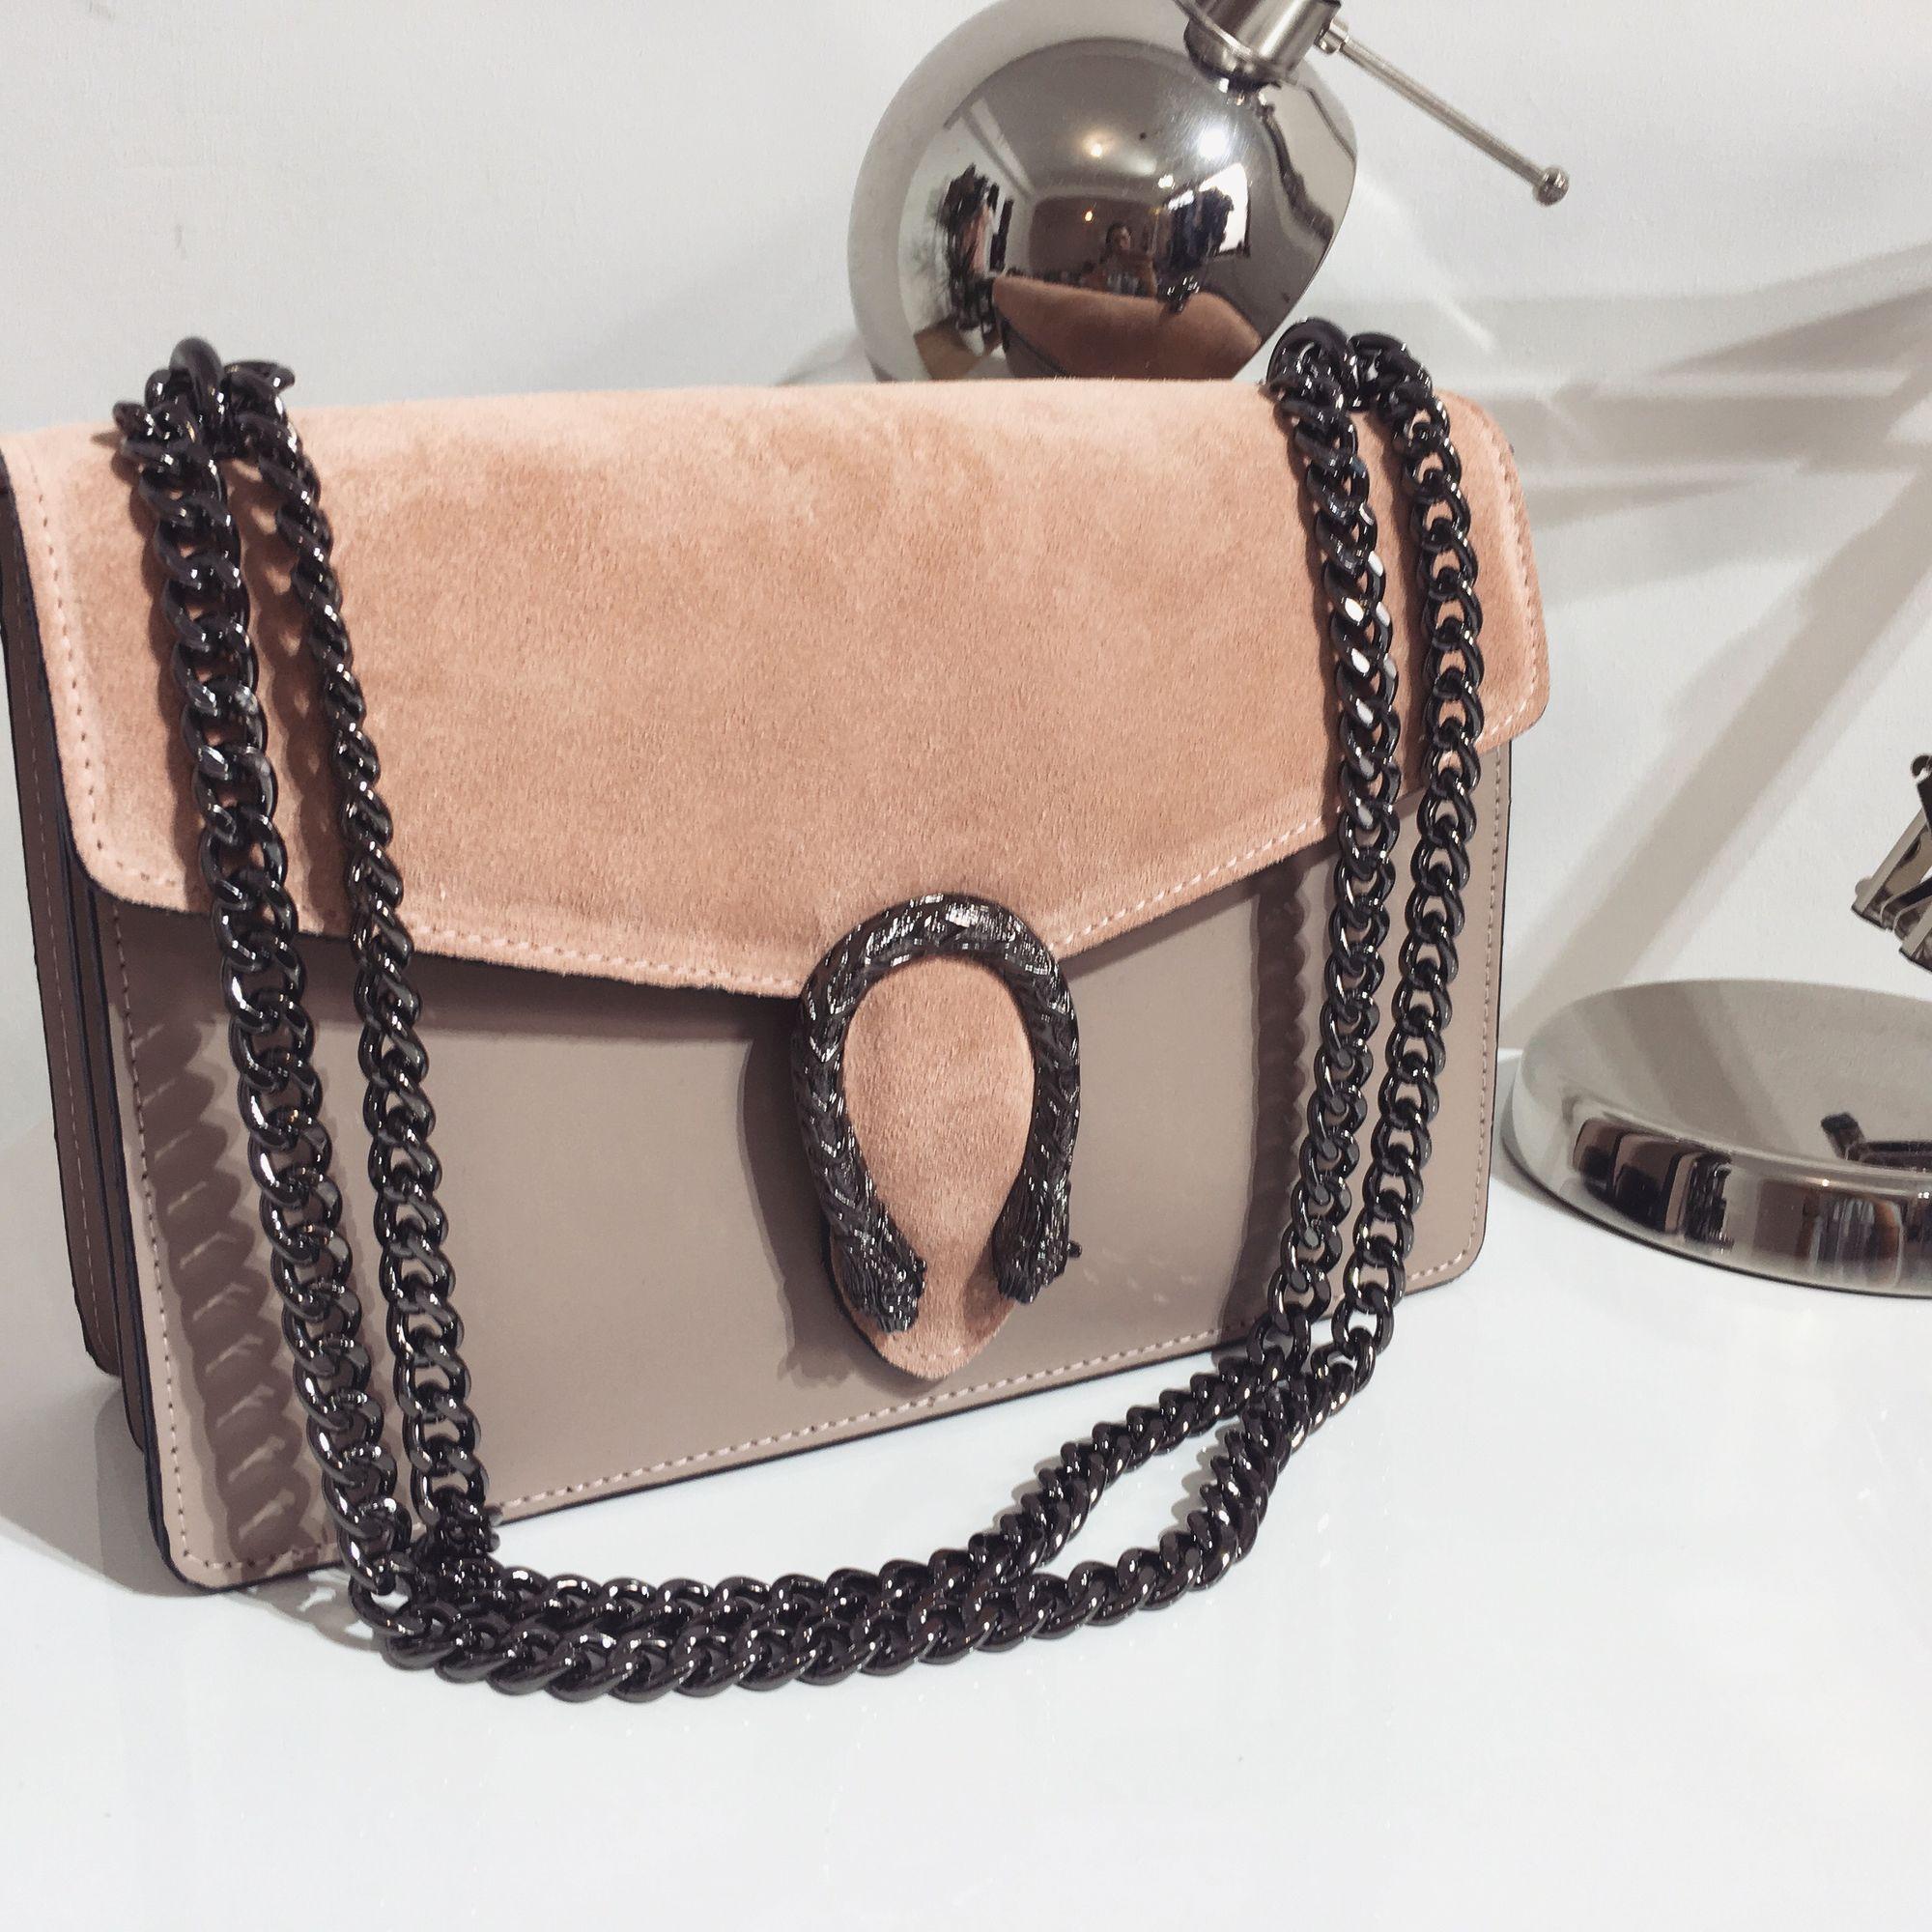 Бежевая сумка с цепью